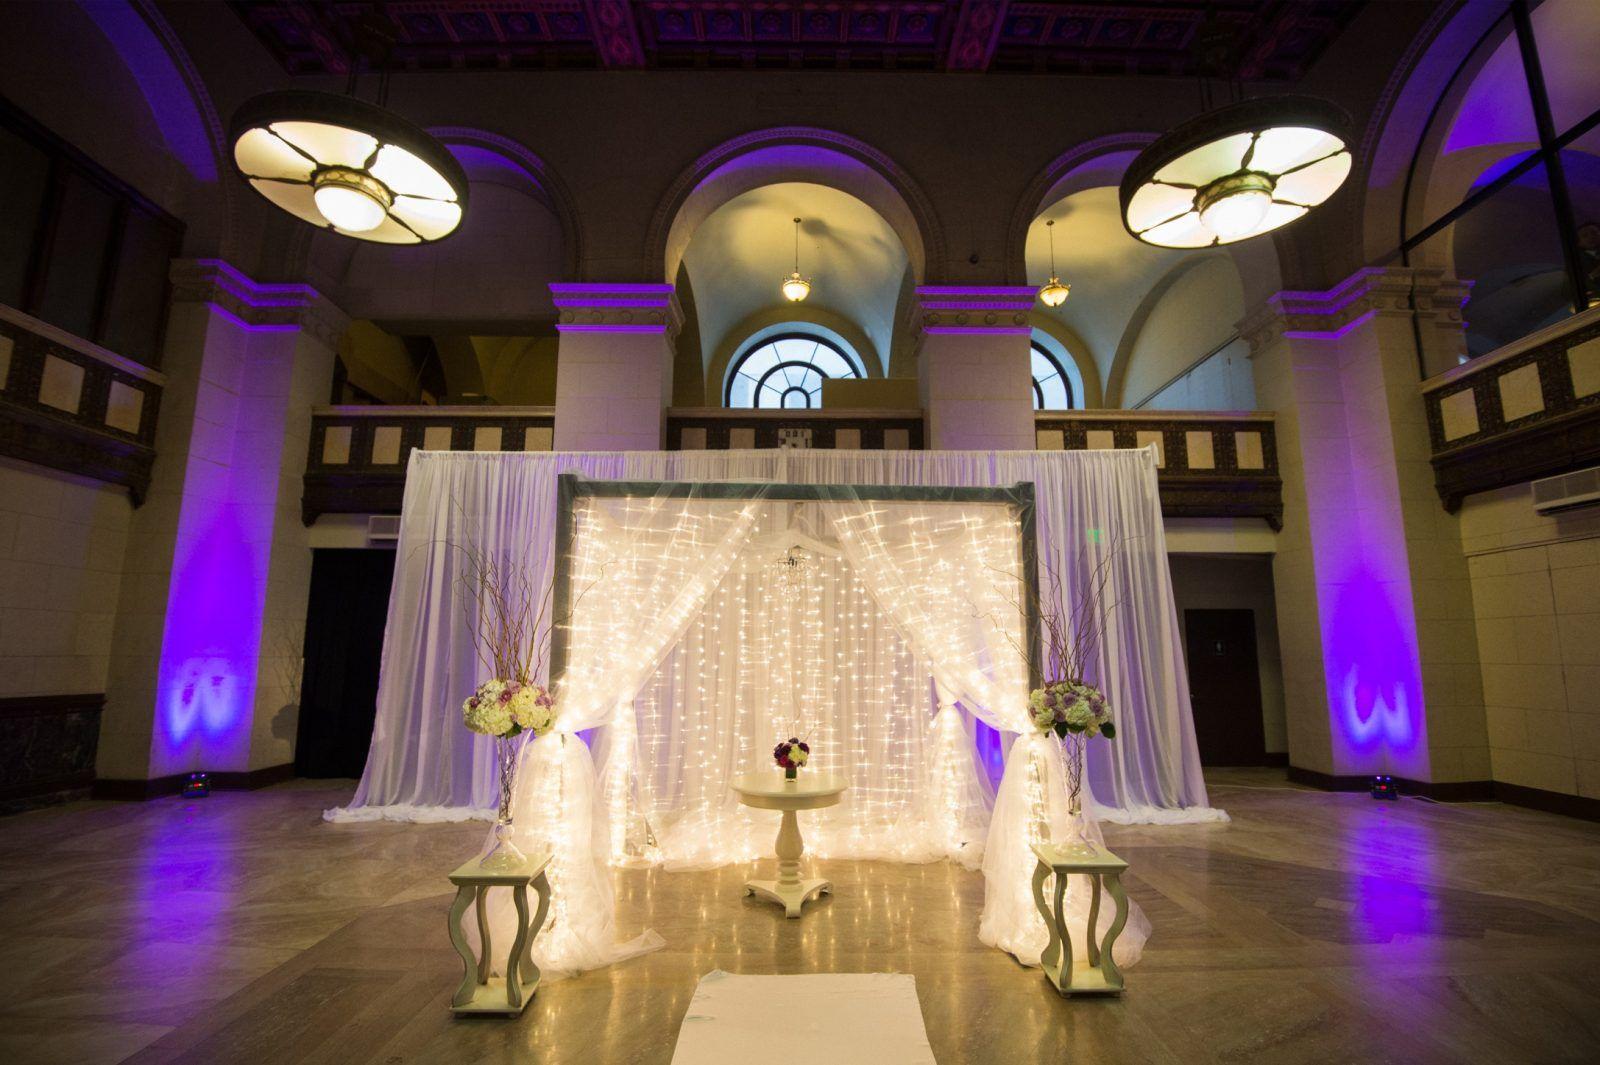 Unique wedding stage decoration ideas  Alter Stands  Wedding Ceremony Ideas  Pinterest  Wedding ceremony